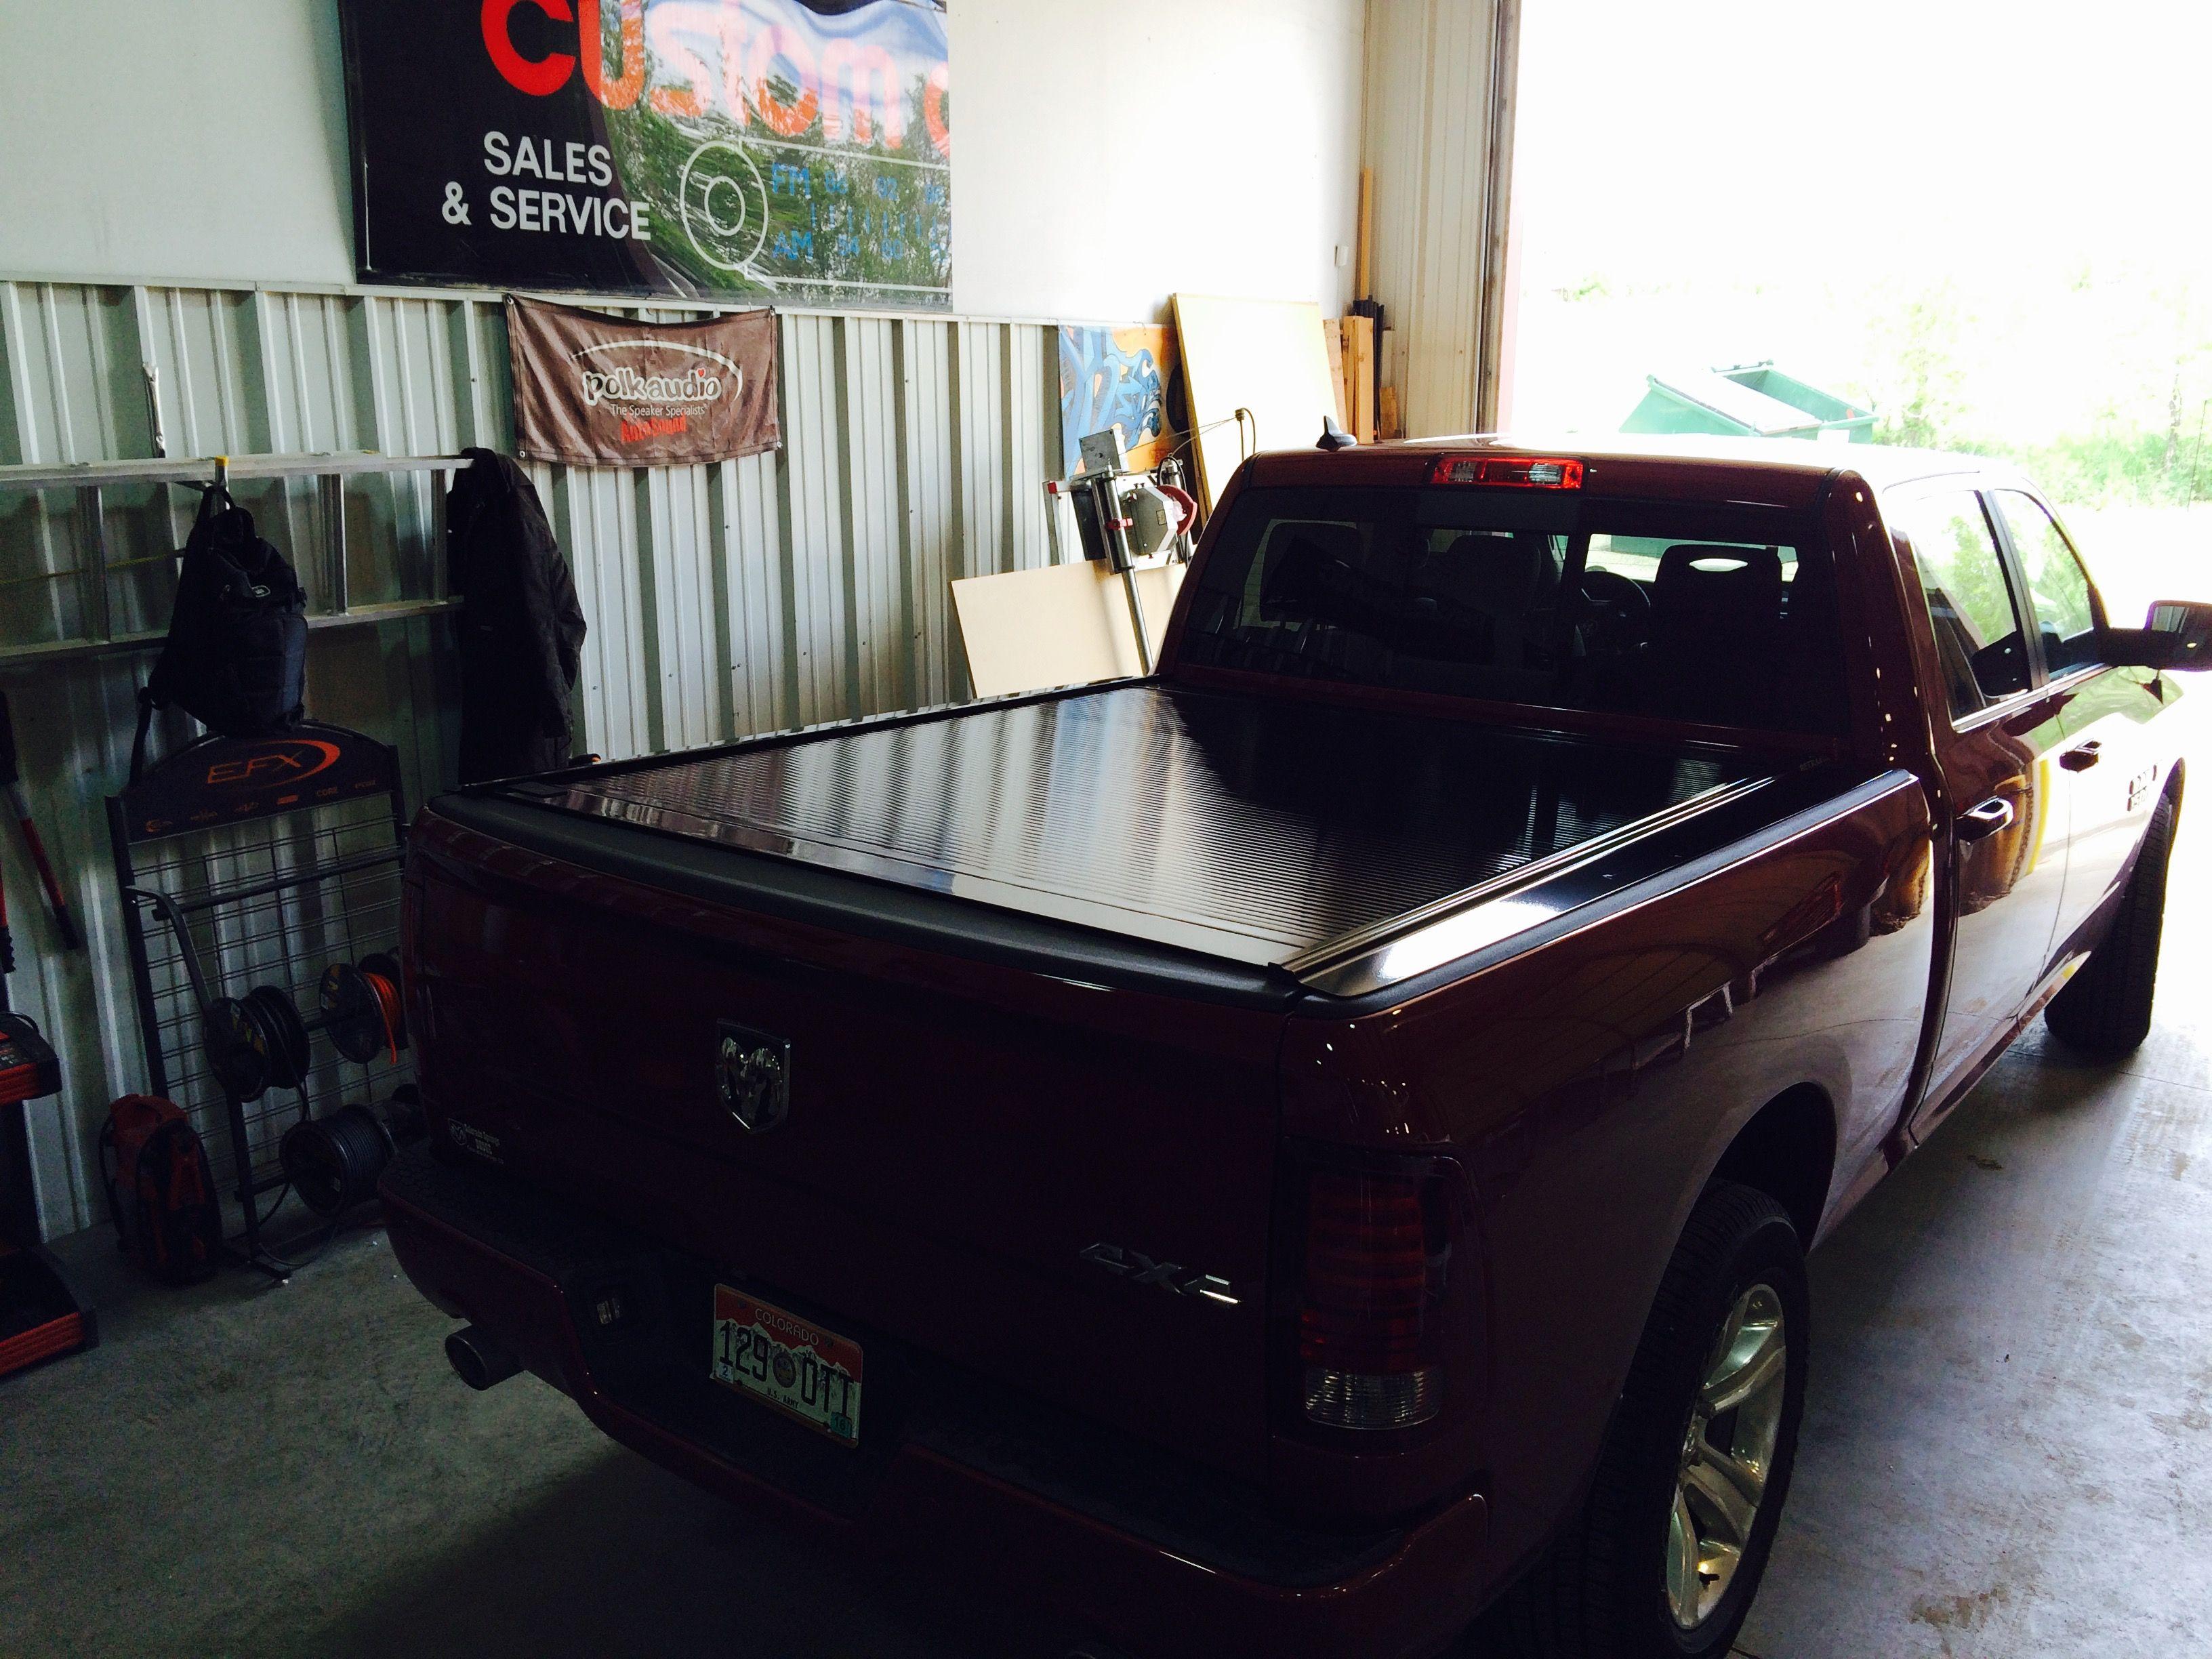 Truck Bed Rollup Covers Truck bed covers, Truck